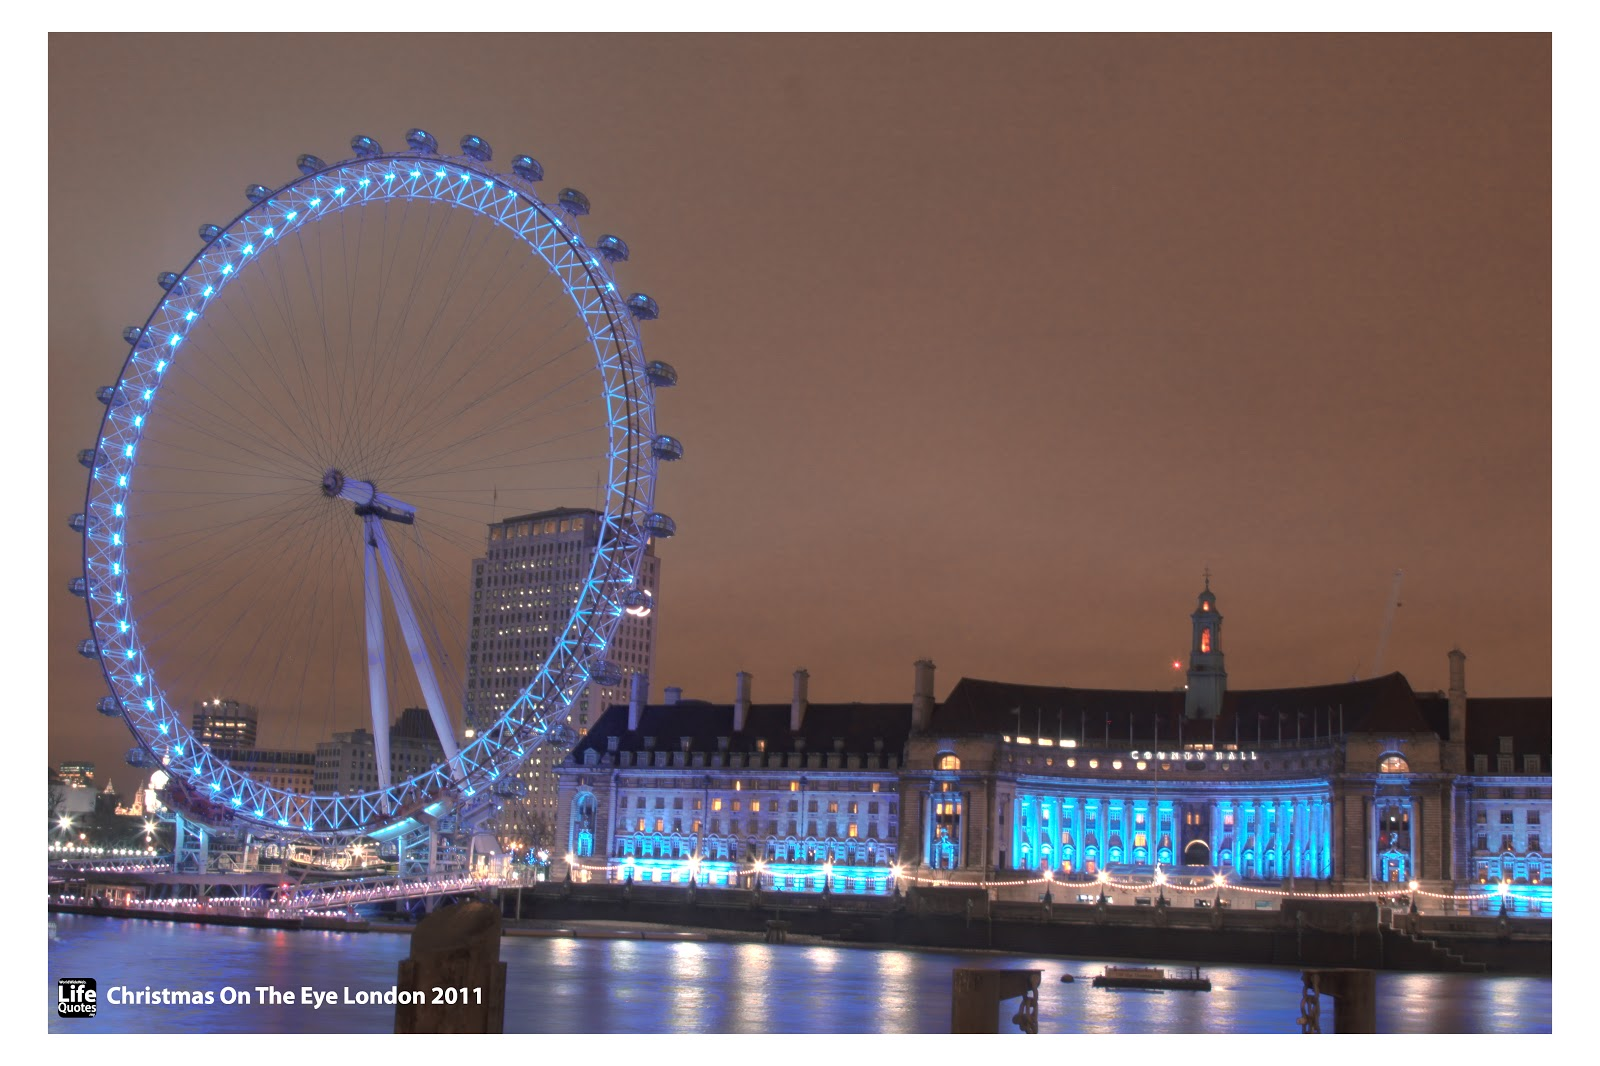 http://3.bp.blogspot.com/-CQ4-IbwGZm8/Tve4vHnNLcI/AAAAAAAABGs/uuWmF0u-8qI/s1600/The_Eye_HDR.jpg